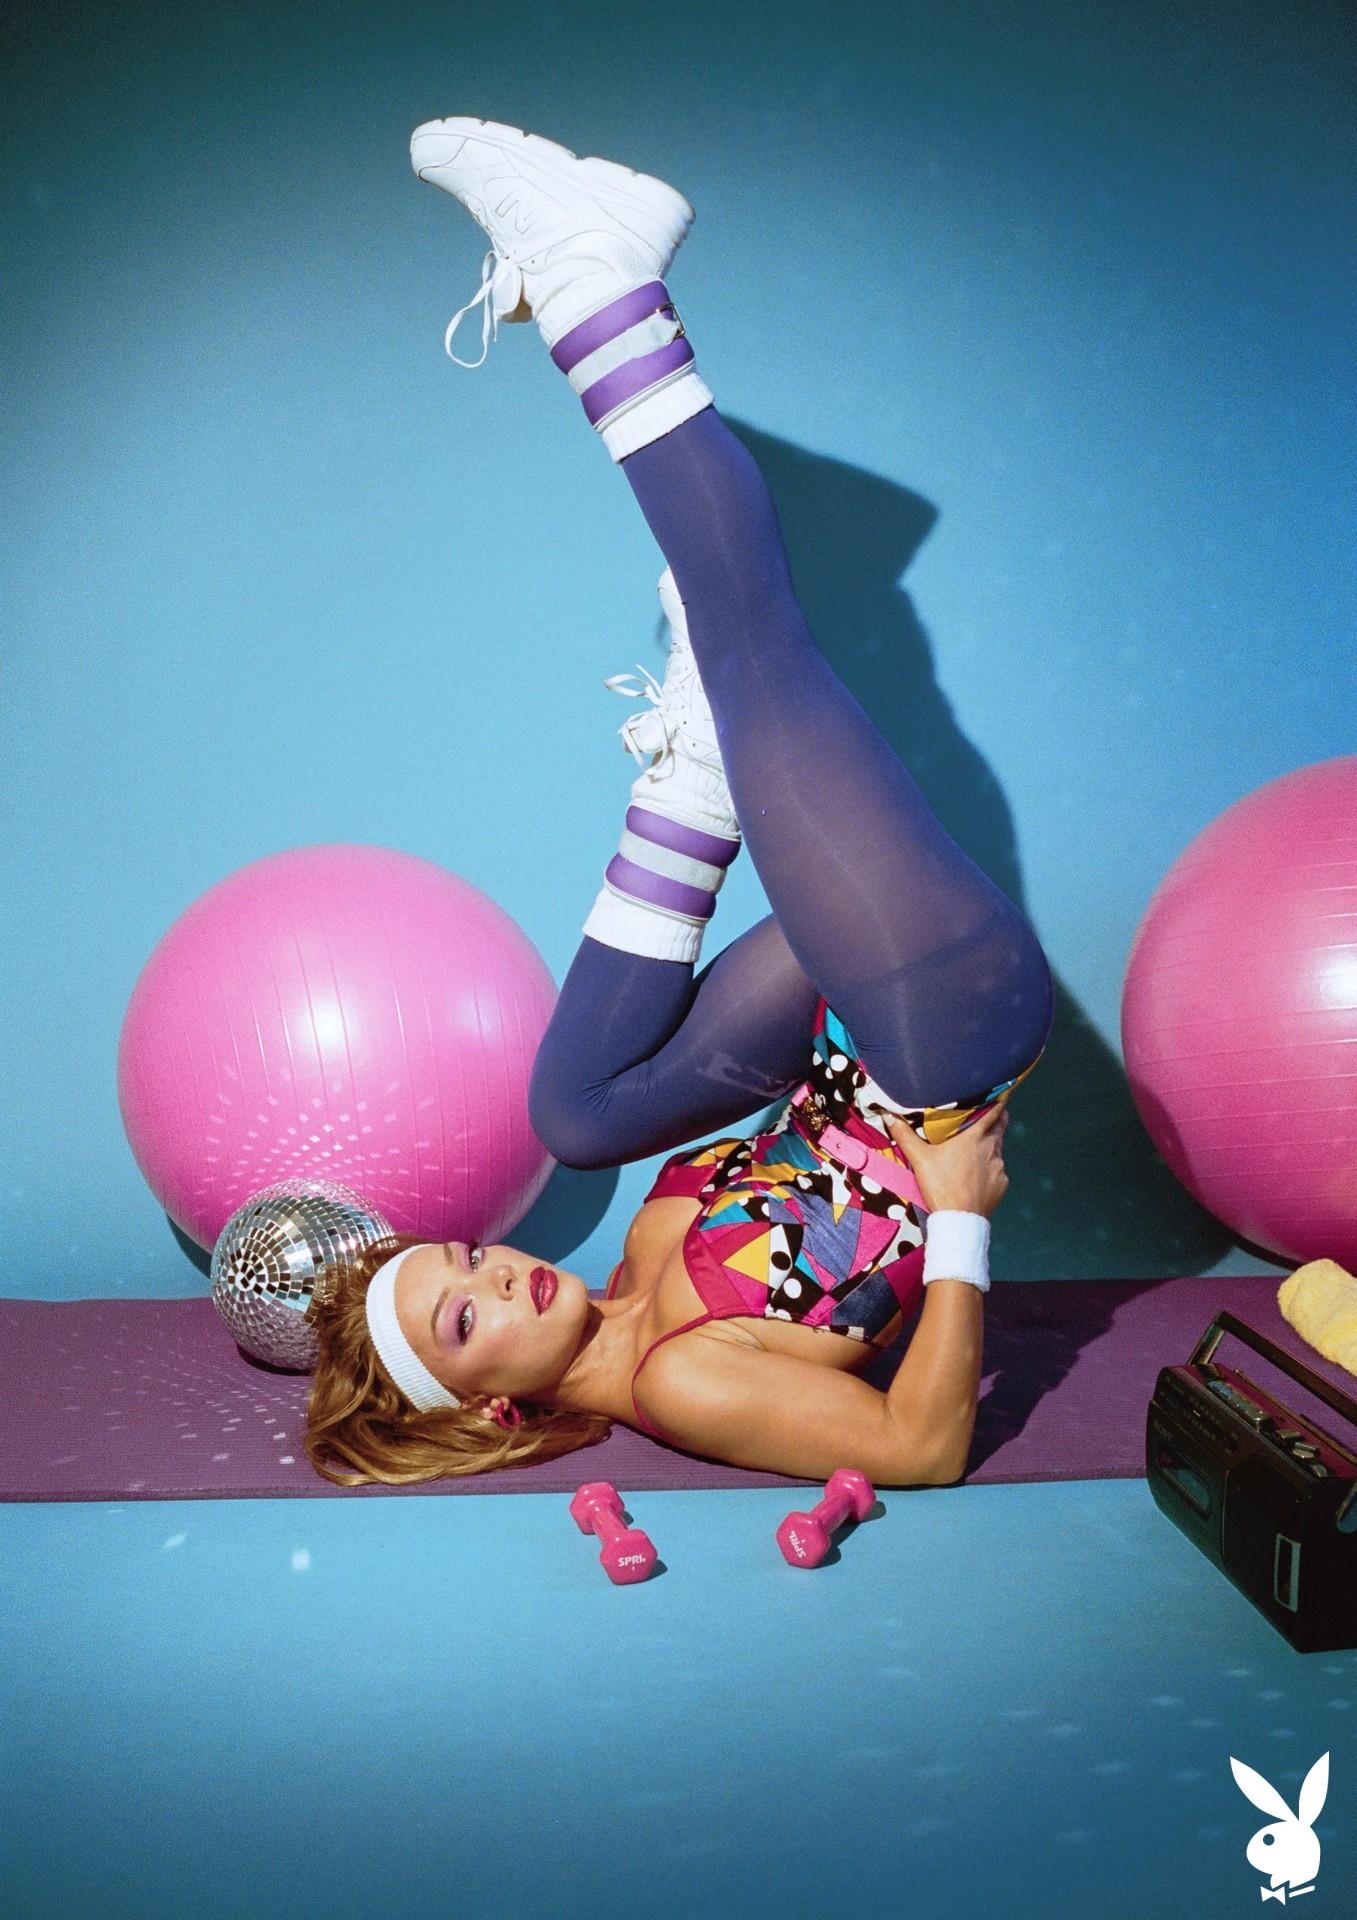 Aubrey Destremps In Let's Get Physical (5)